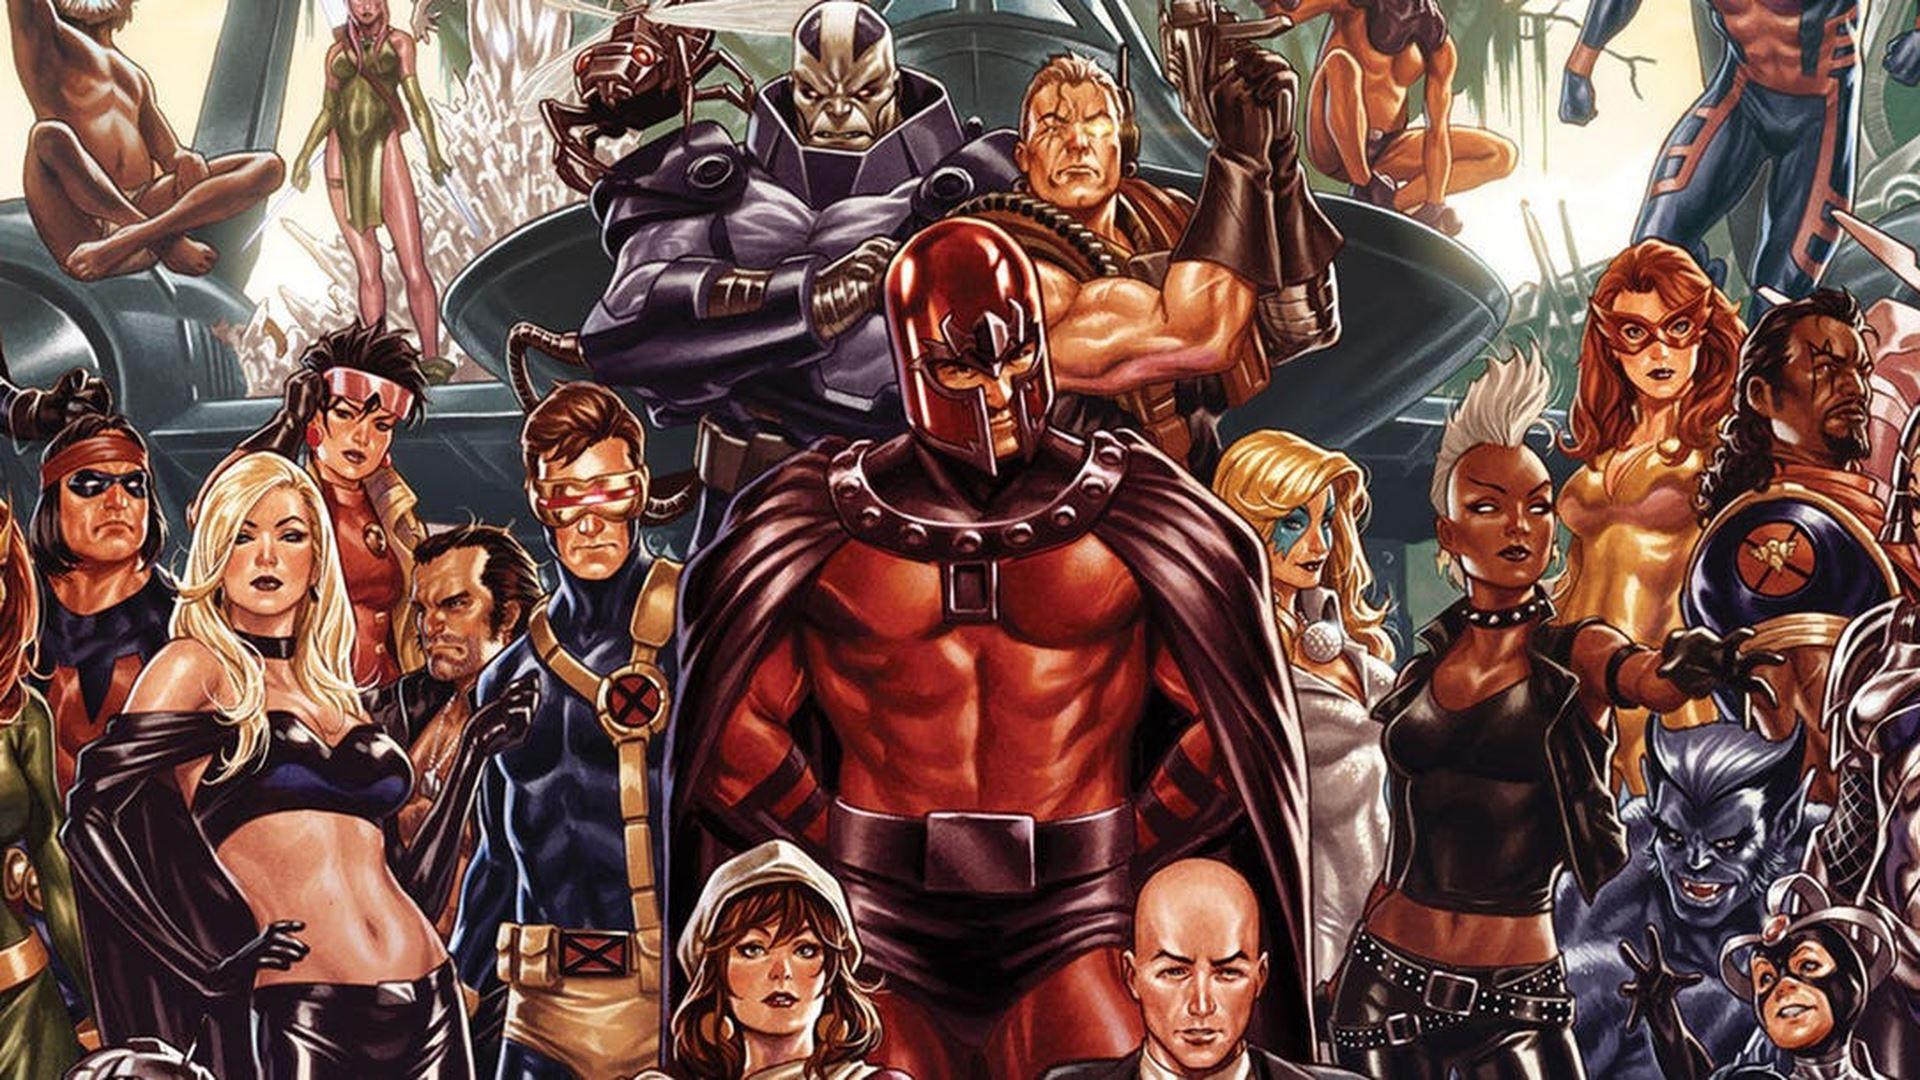 X-Men – Jonathan Hickman abbandonerà i mutanti dopo Inferno